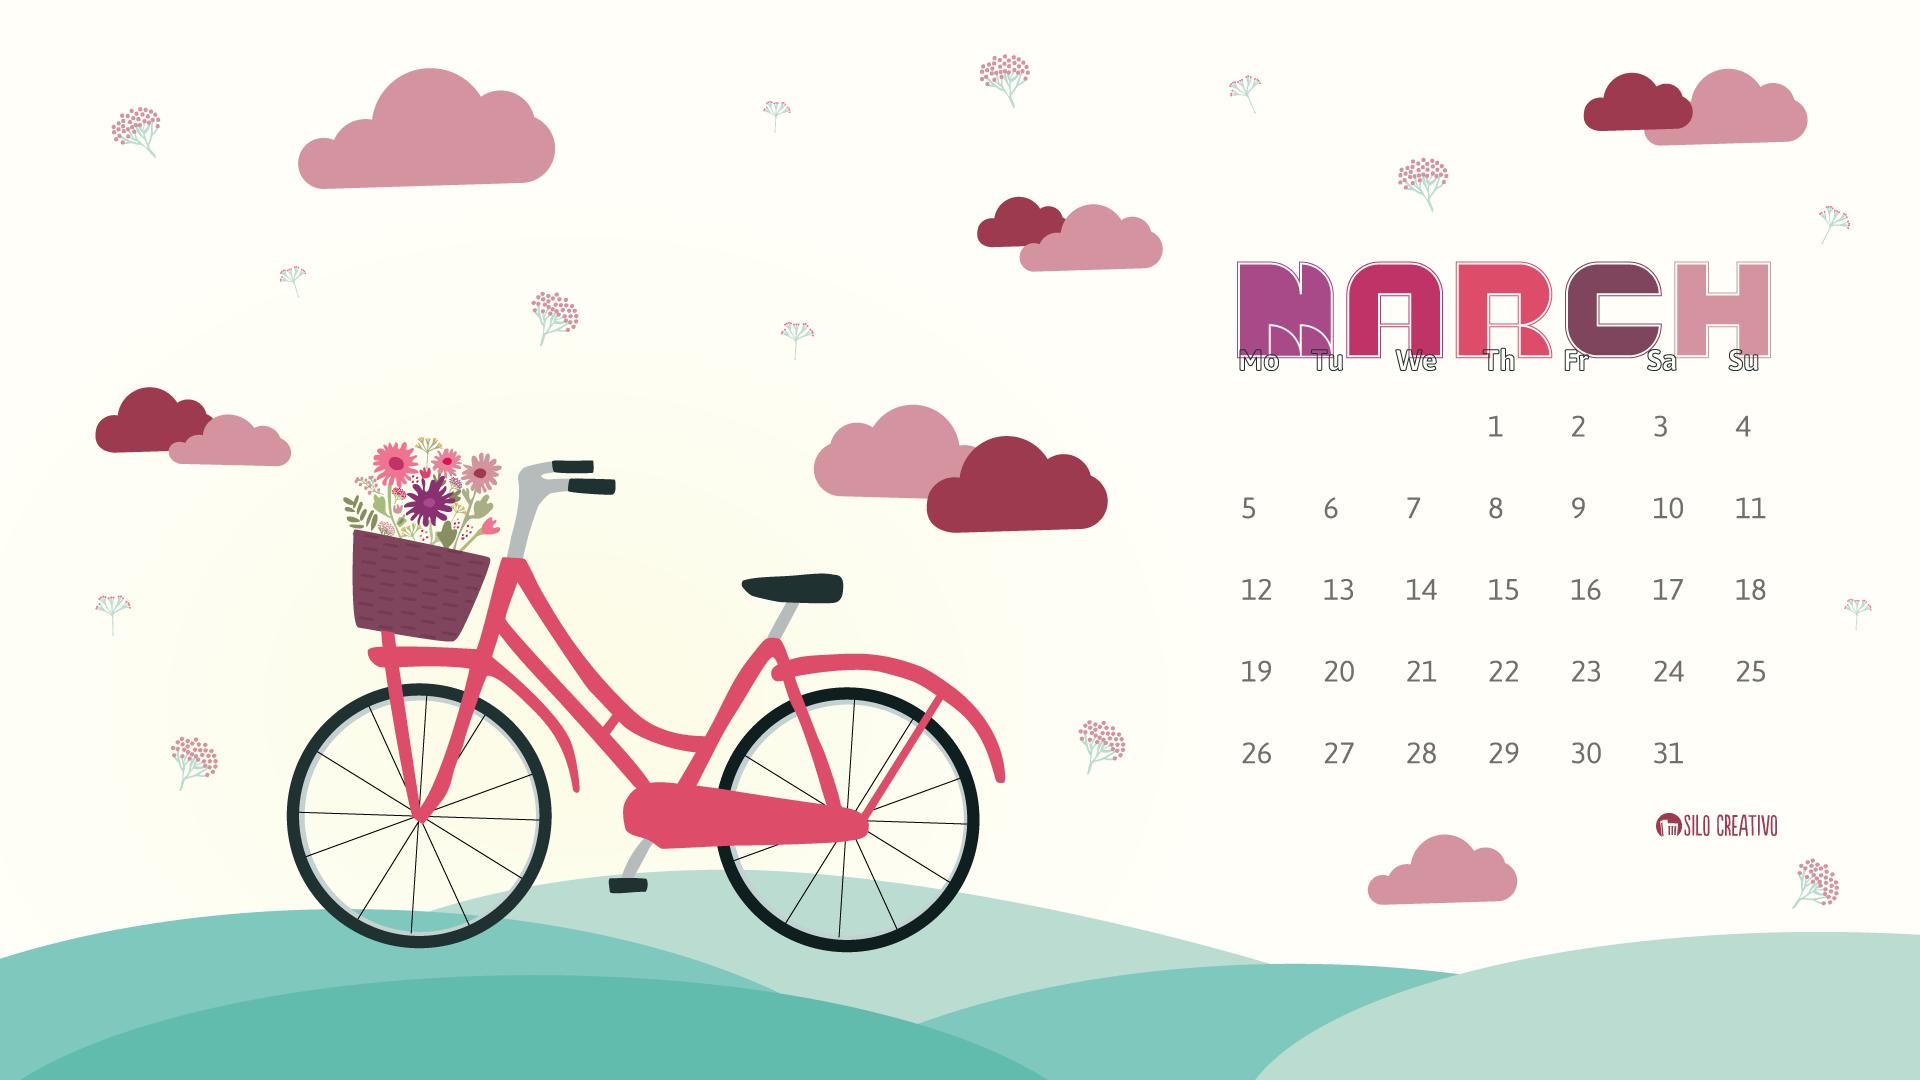 Calendar clipart march 2018. Downloadable silo creativo if